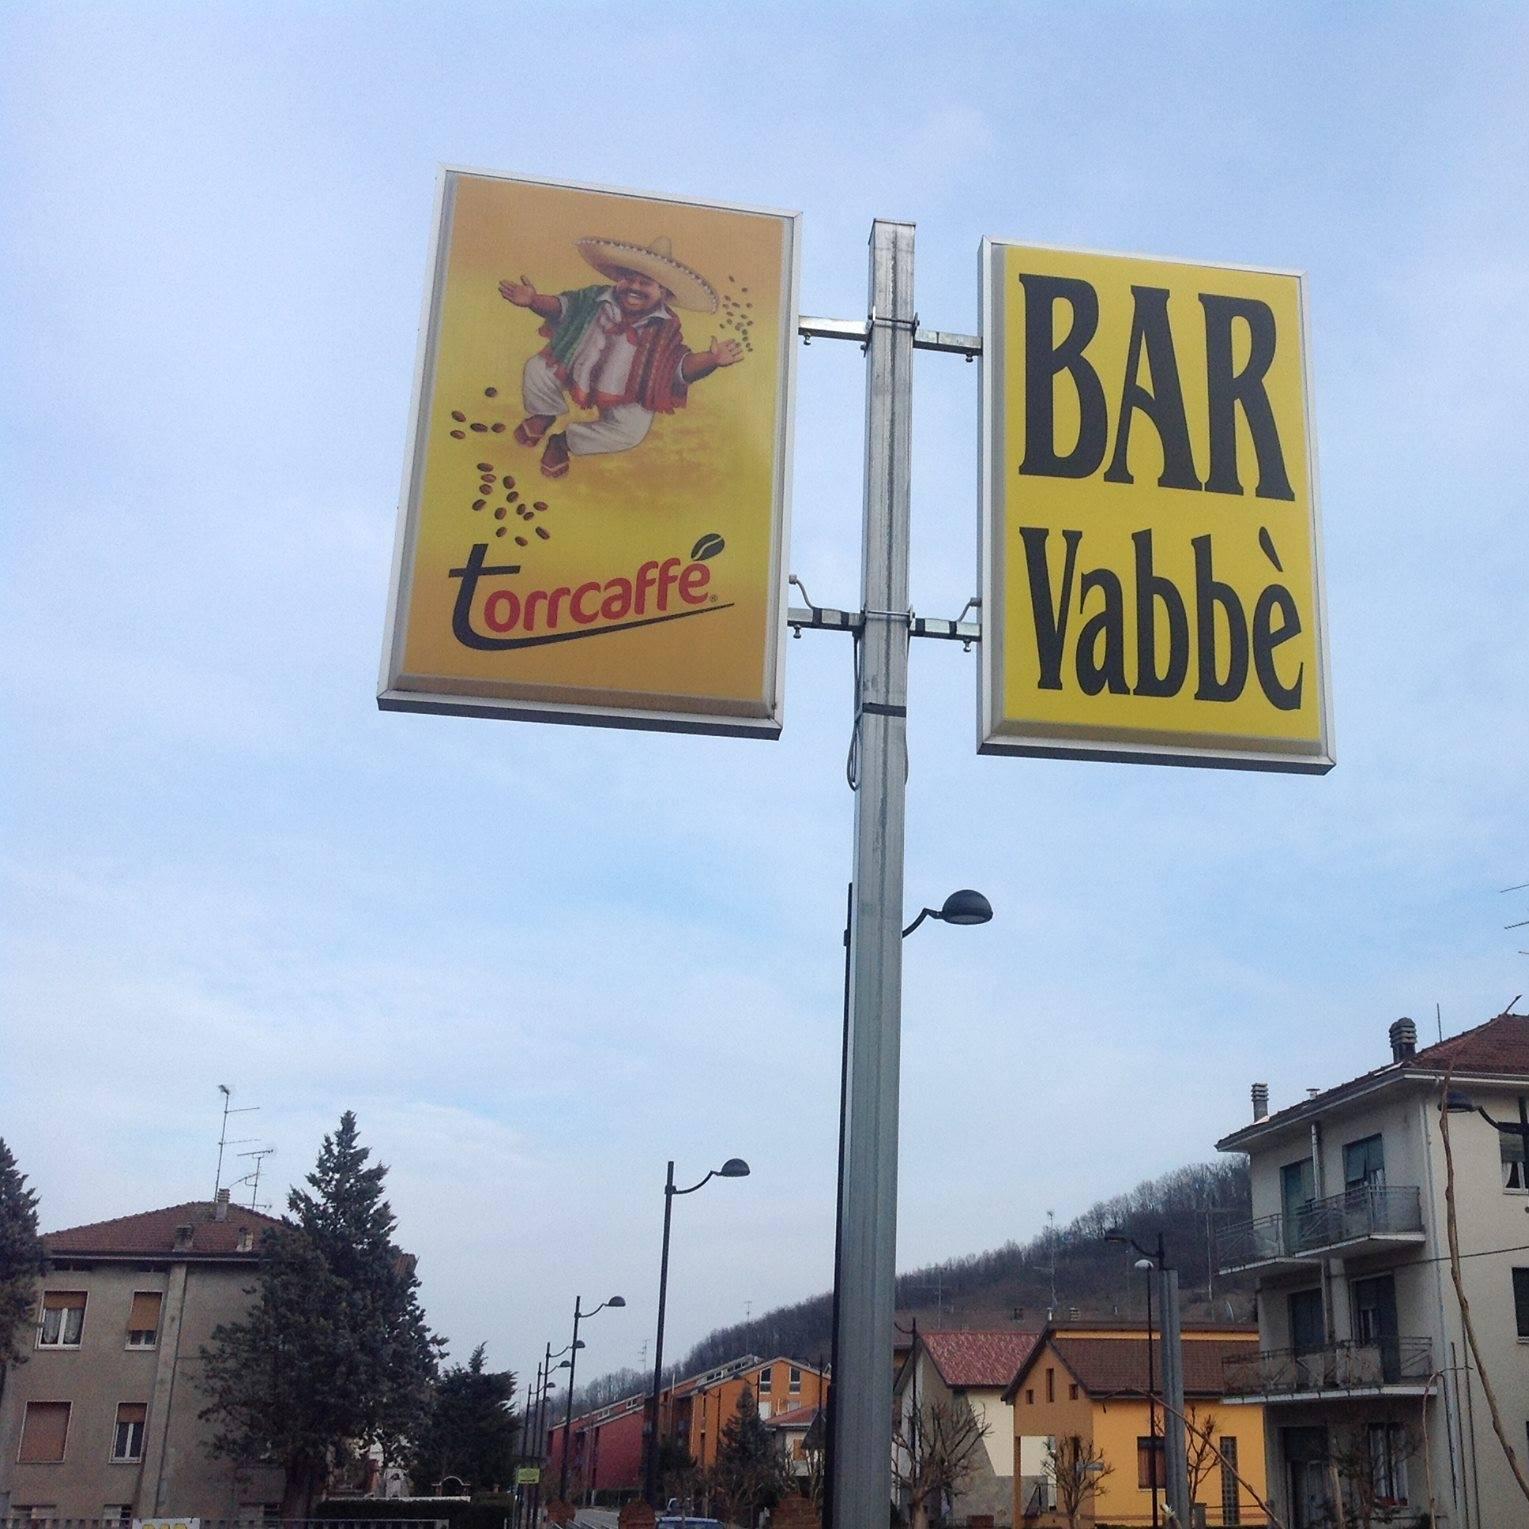 San\'Andrea Bagni: lite in un Bar, grave una donna - VIDEO - ParmaPress24